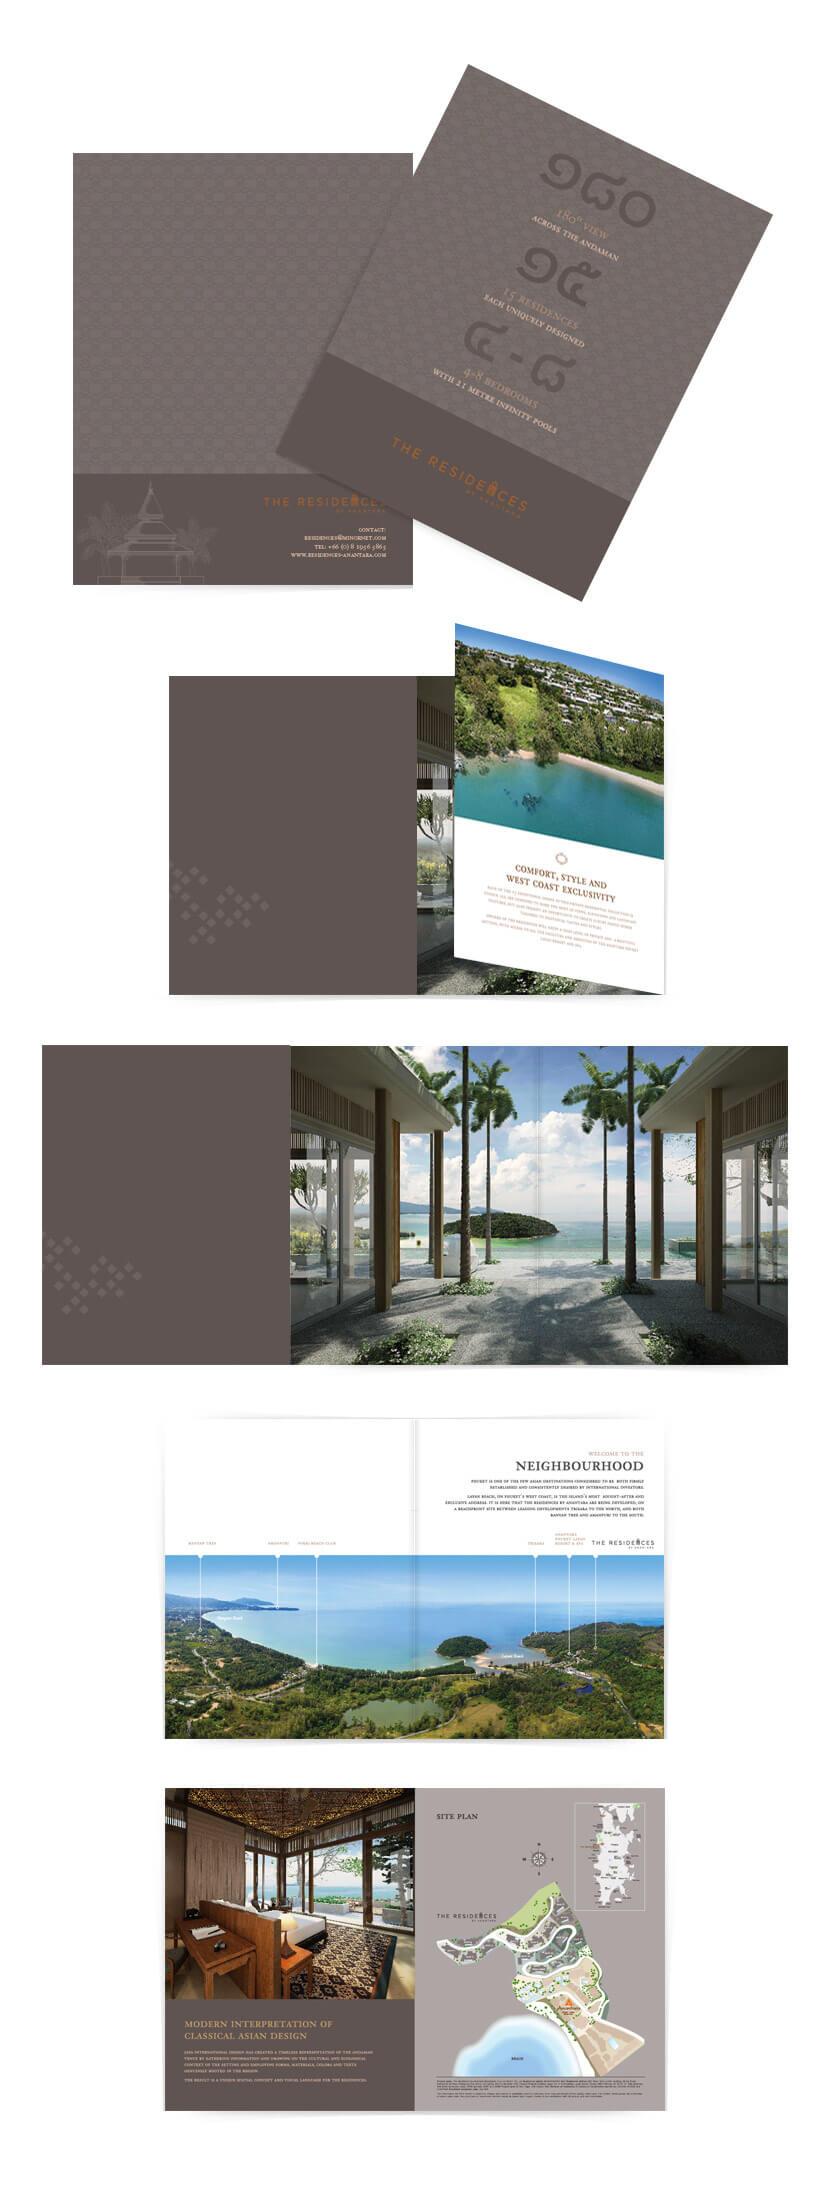 Print Design - The Residence